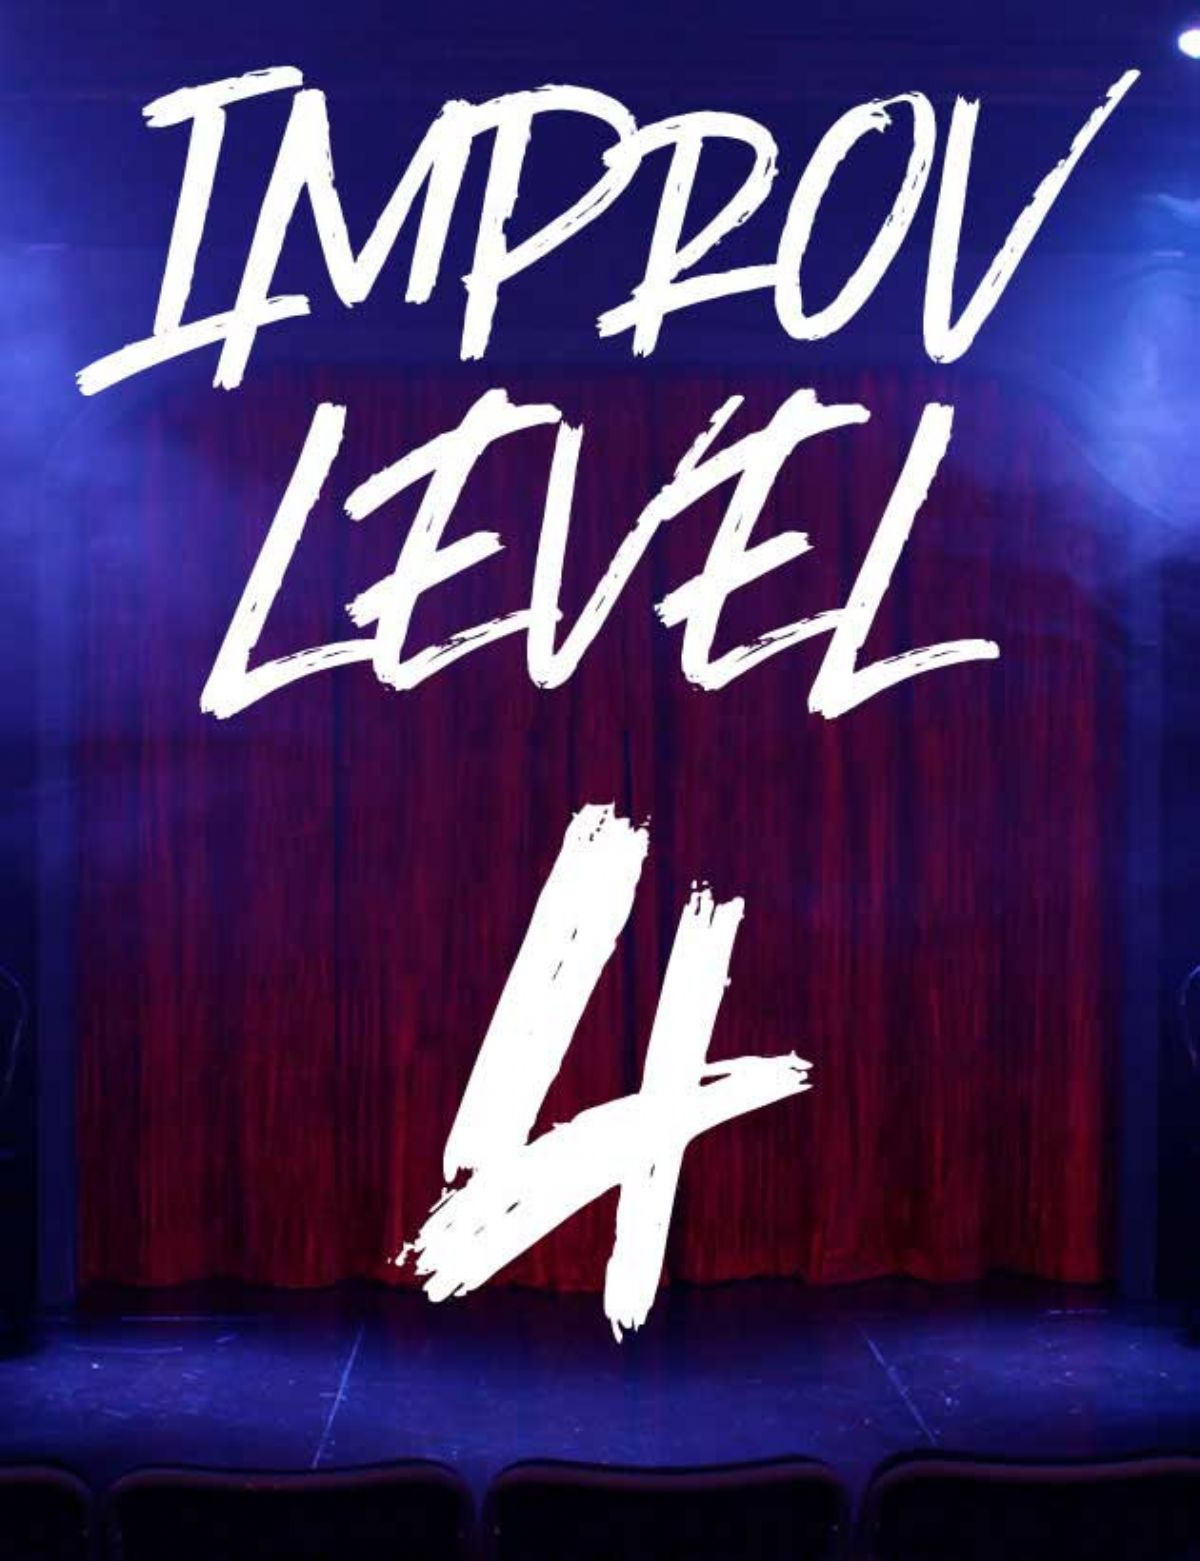 CLASS: Improv Level 4 w/ Tim, Mondays (2020-3)